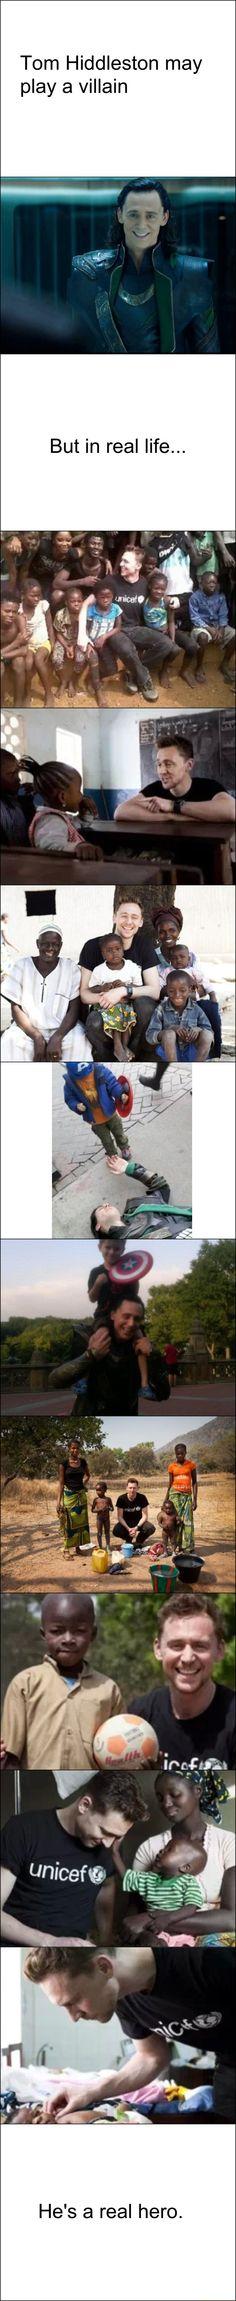 Real life hero